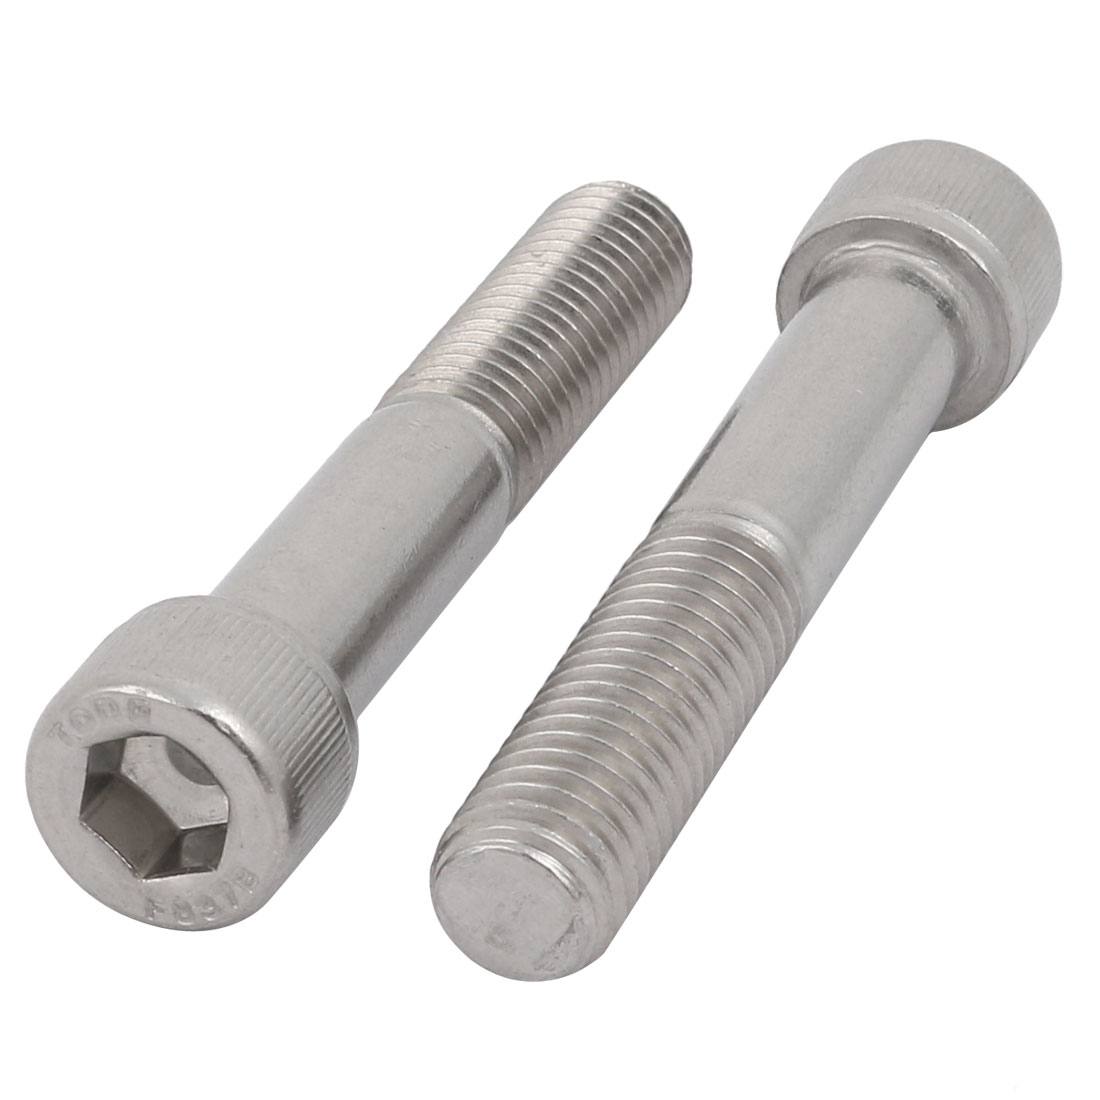 "1/2-13 x 3"" Stainless Steel Partially Threaded Hex Socket Head Cap Screw 2pcs"